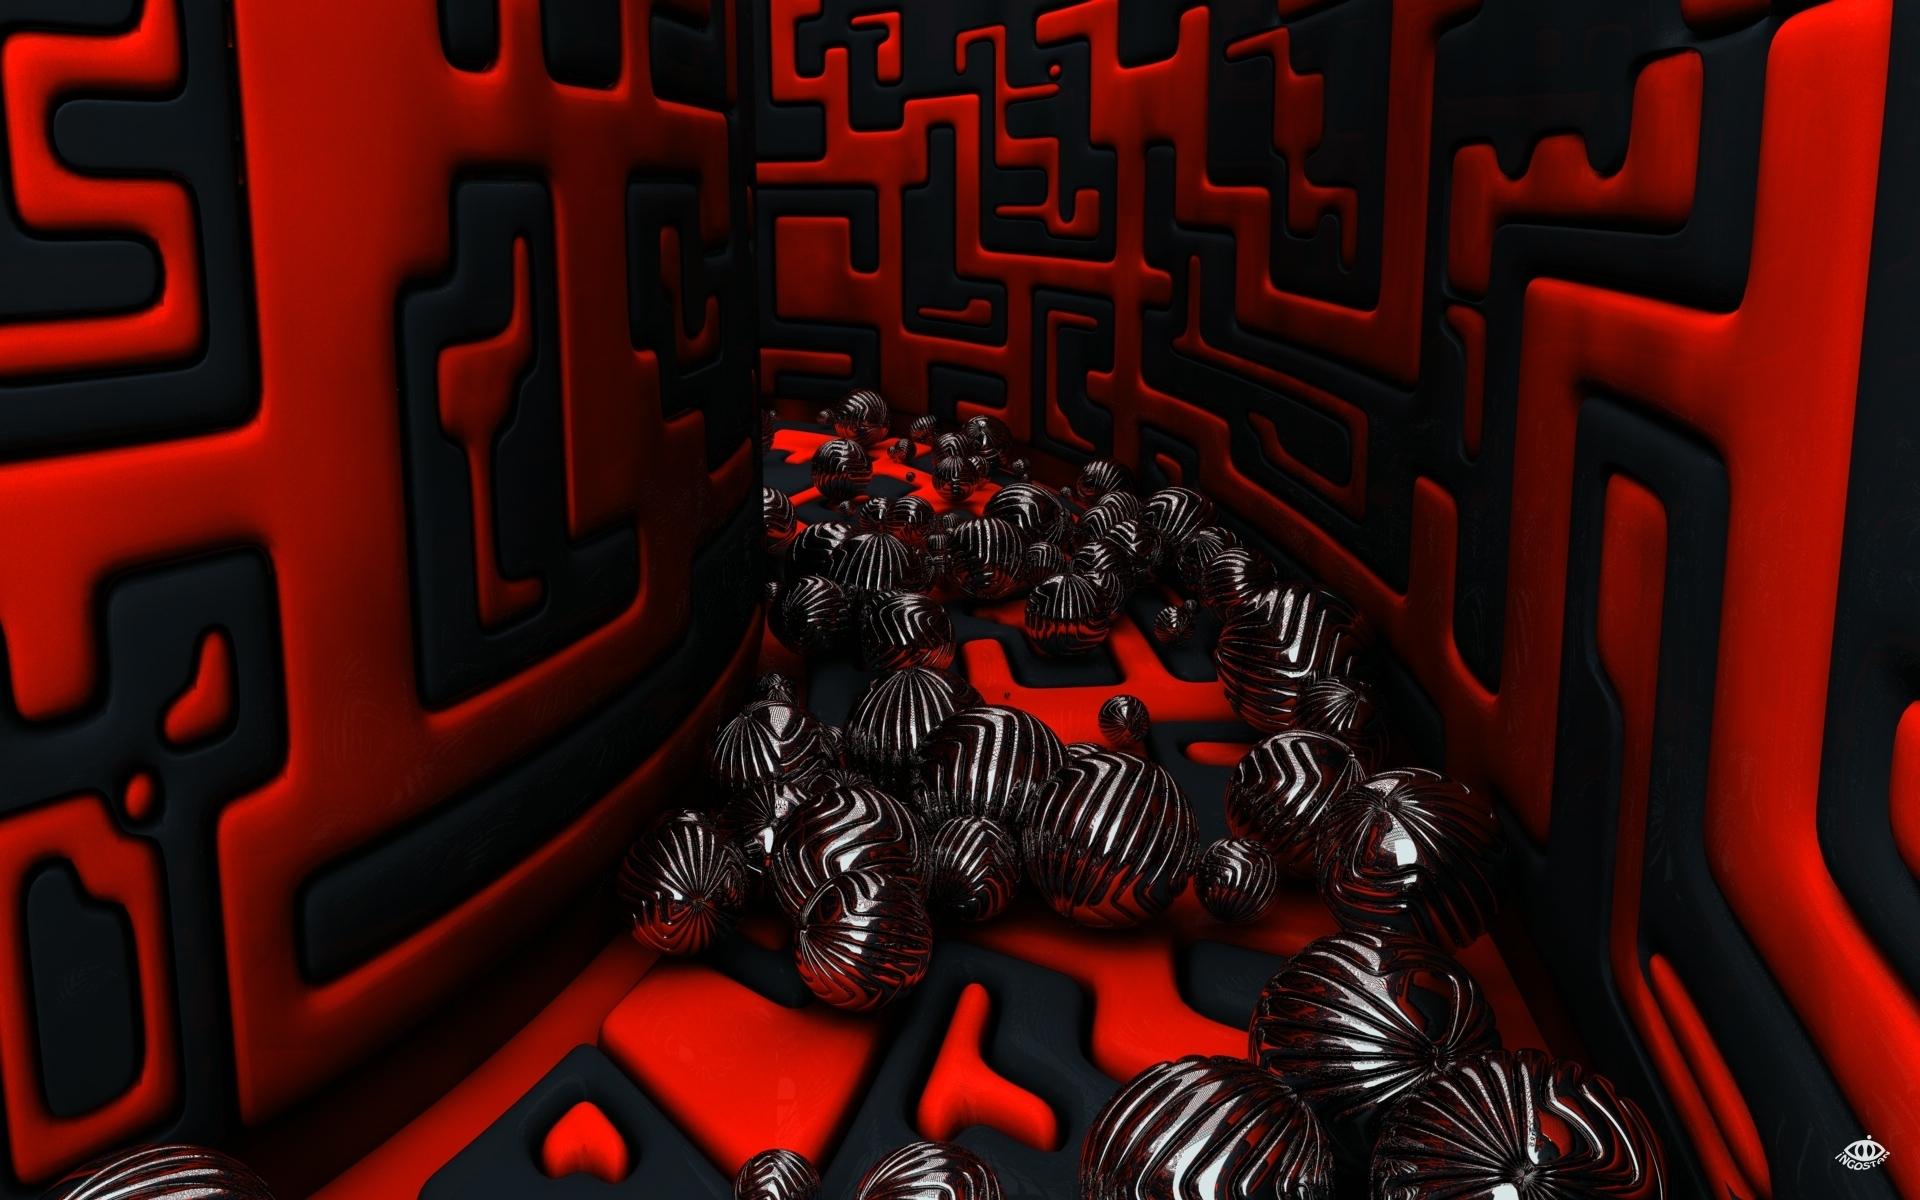 3d red black spheres hd widescreen desktop wallpaper | ideas for the